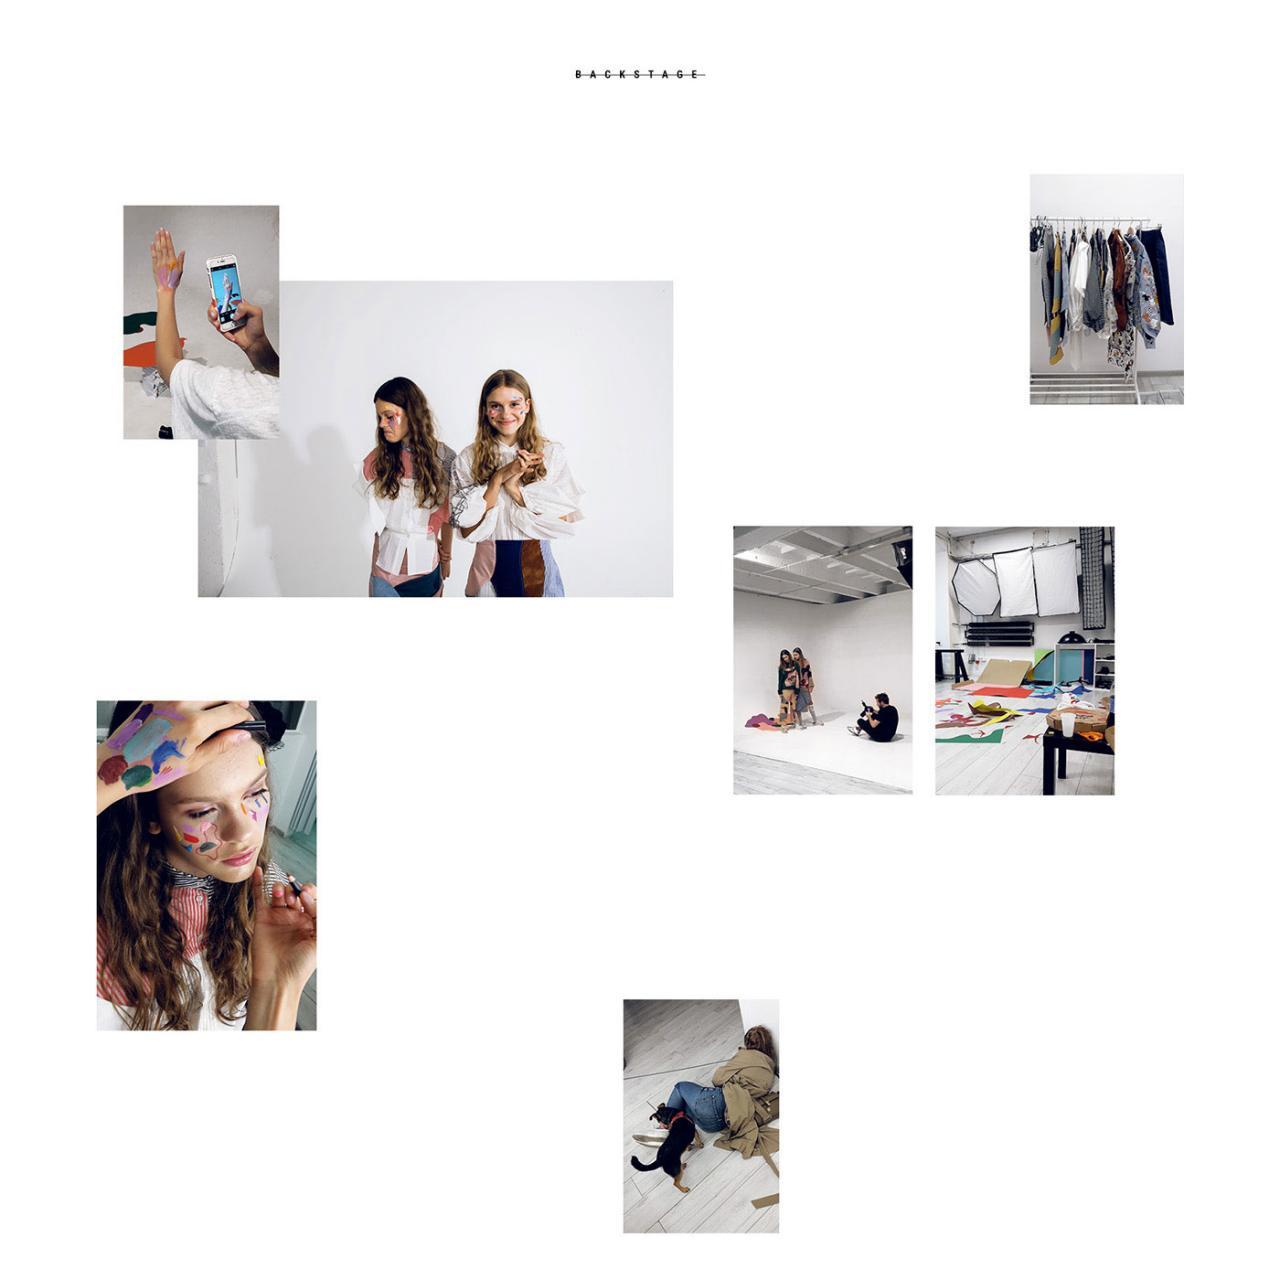 Kamil Kotarba 摄影作品 COLLECTING MEMORIES / Contributor magazine 时尚图库 第10张